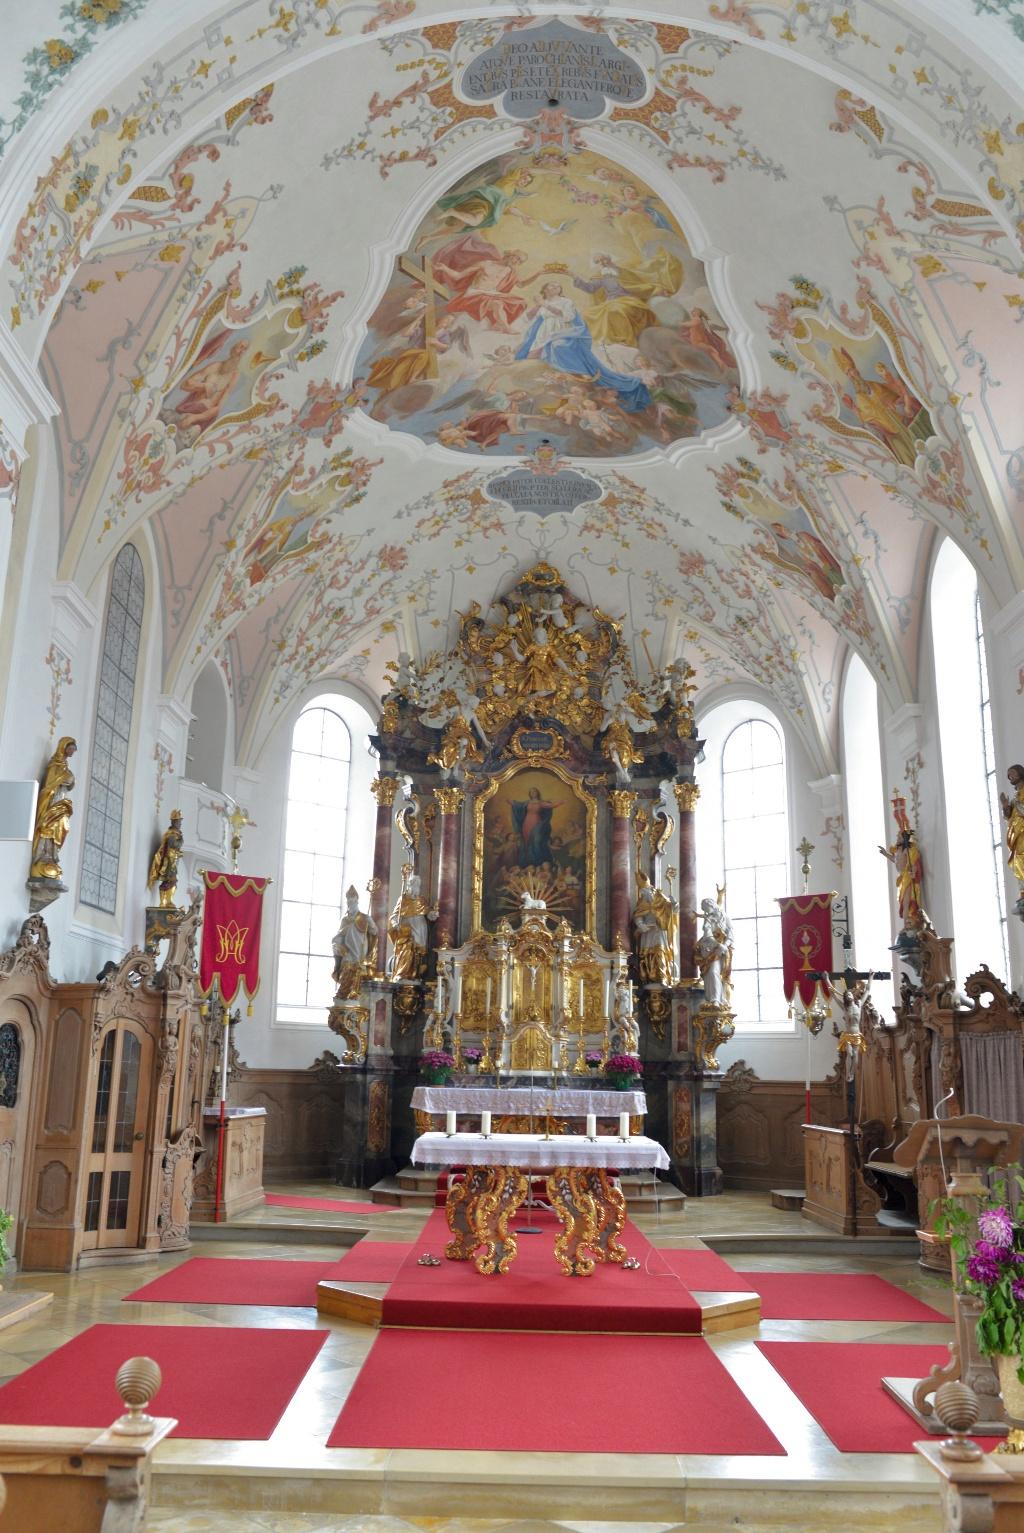 Schöner Kircheninnenraum entlang der Schlossparkradrunde  - @ Autor: MS&P, Michael Schott  - © Quelle: Tourismusverband Ostallgäu e.V.